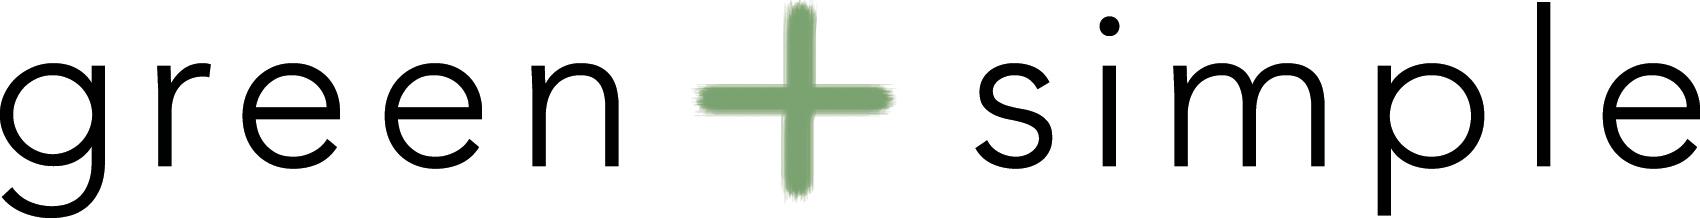 green+simple